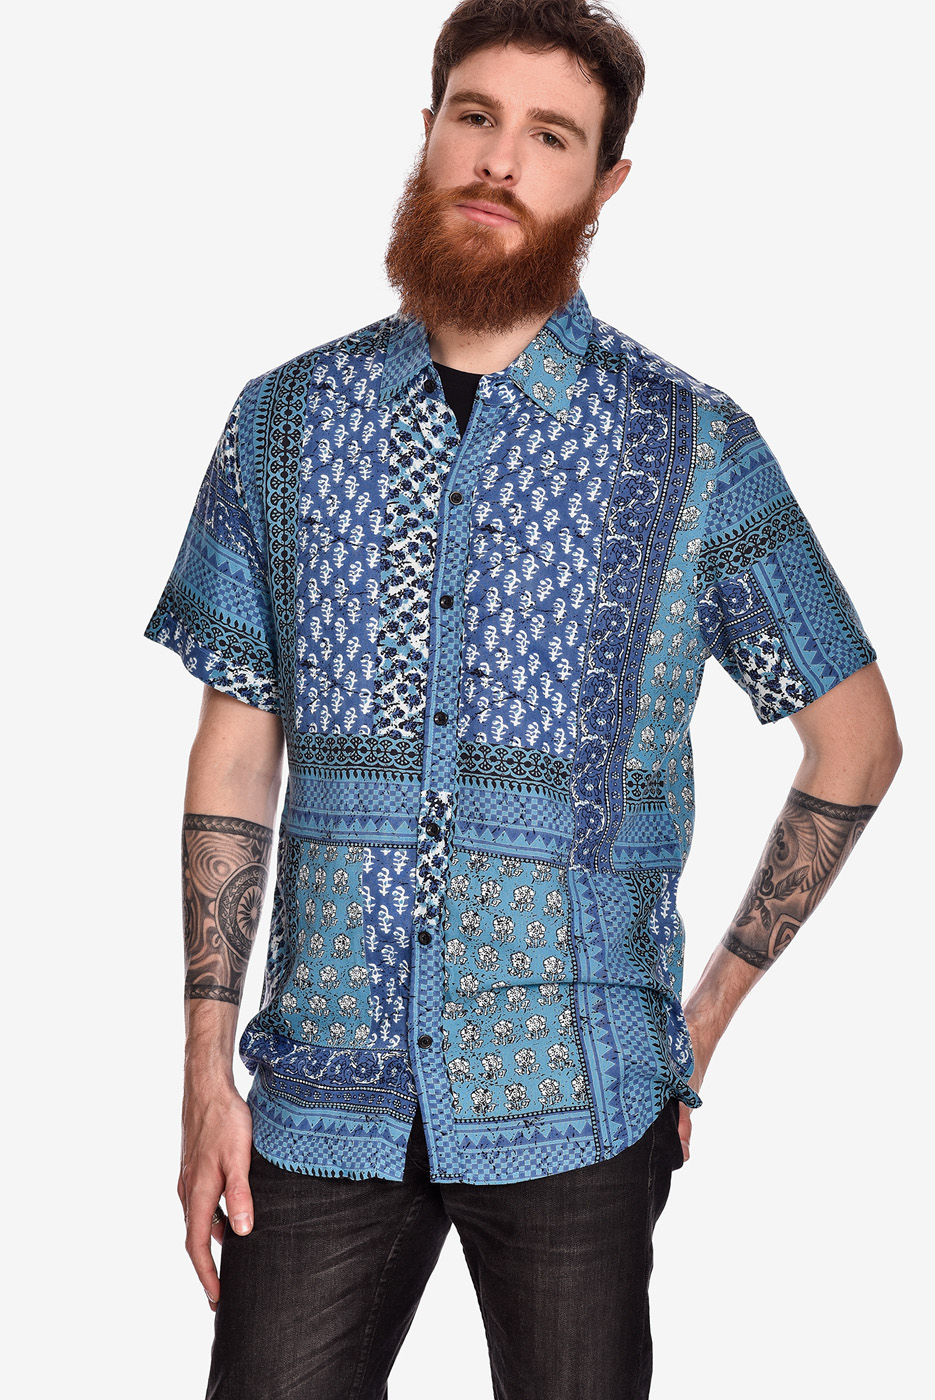 camisa-manga-corta-estampado-rock-pachwork-azul